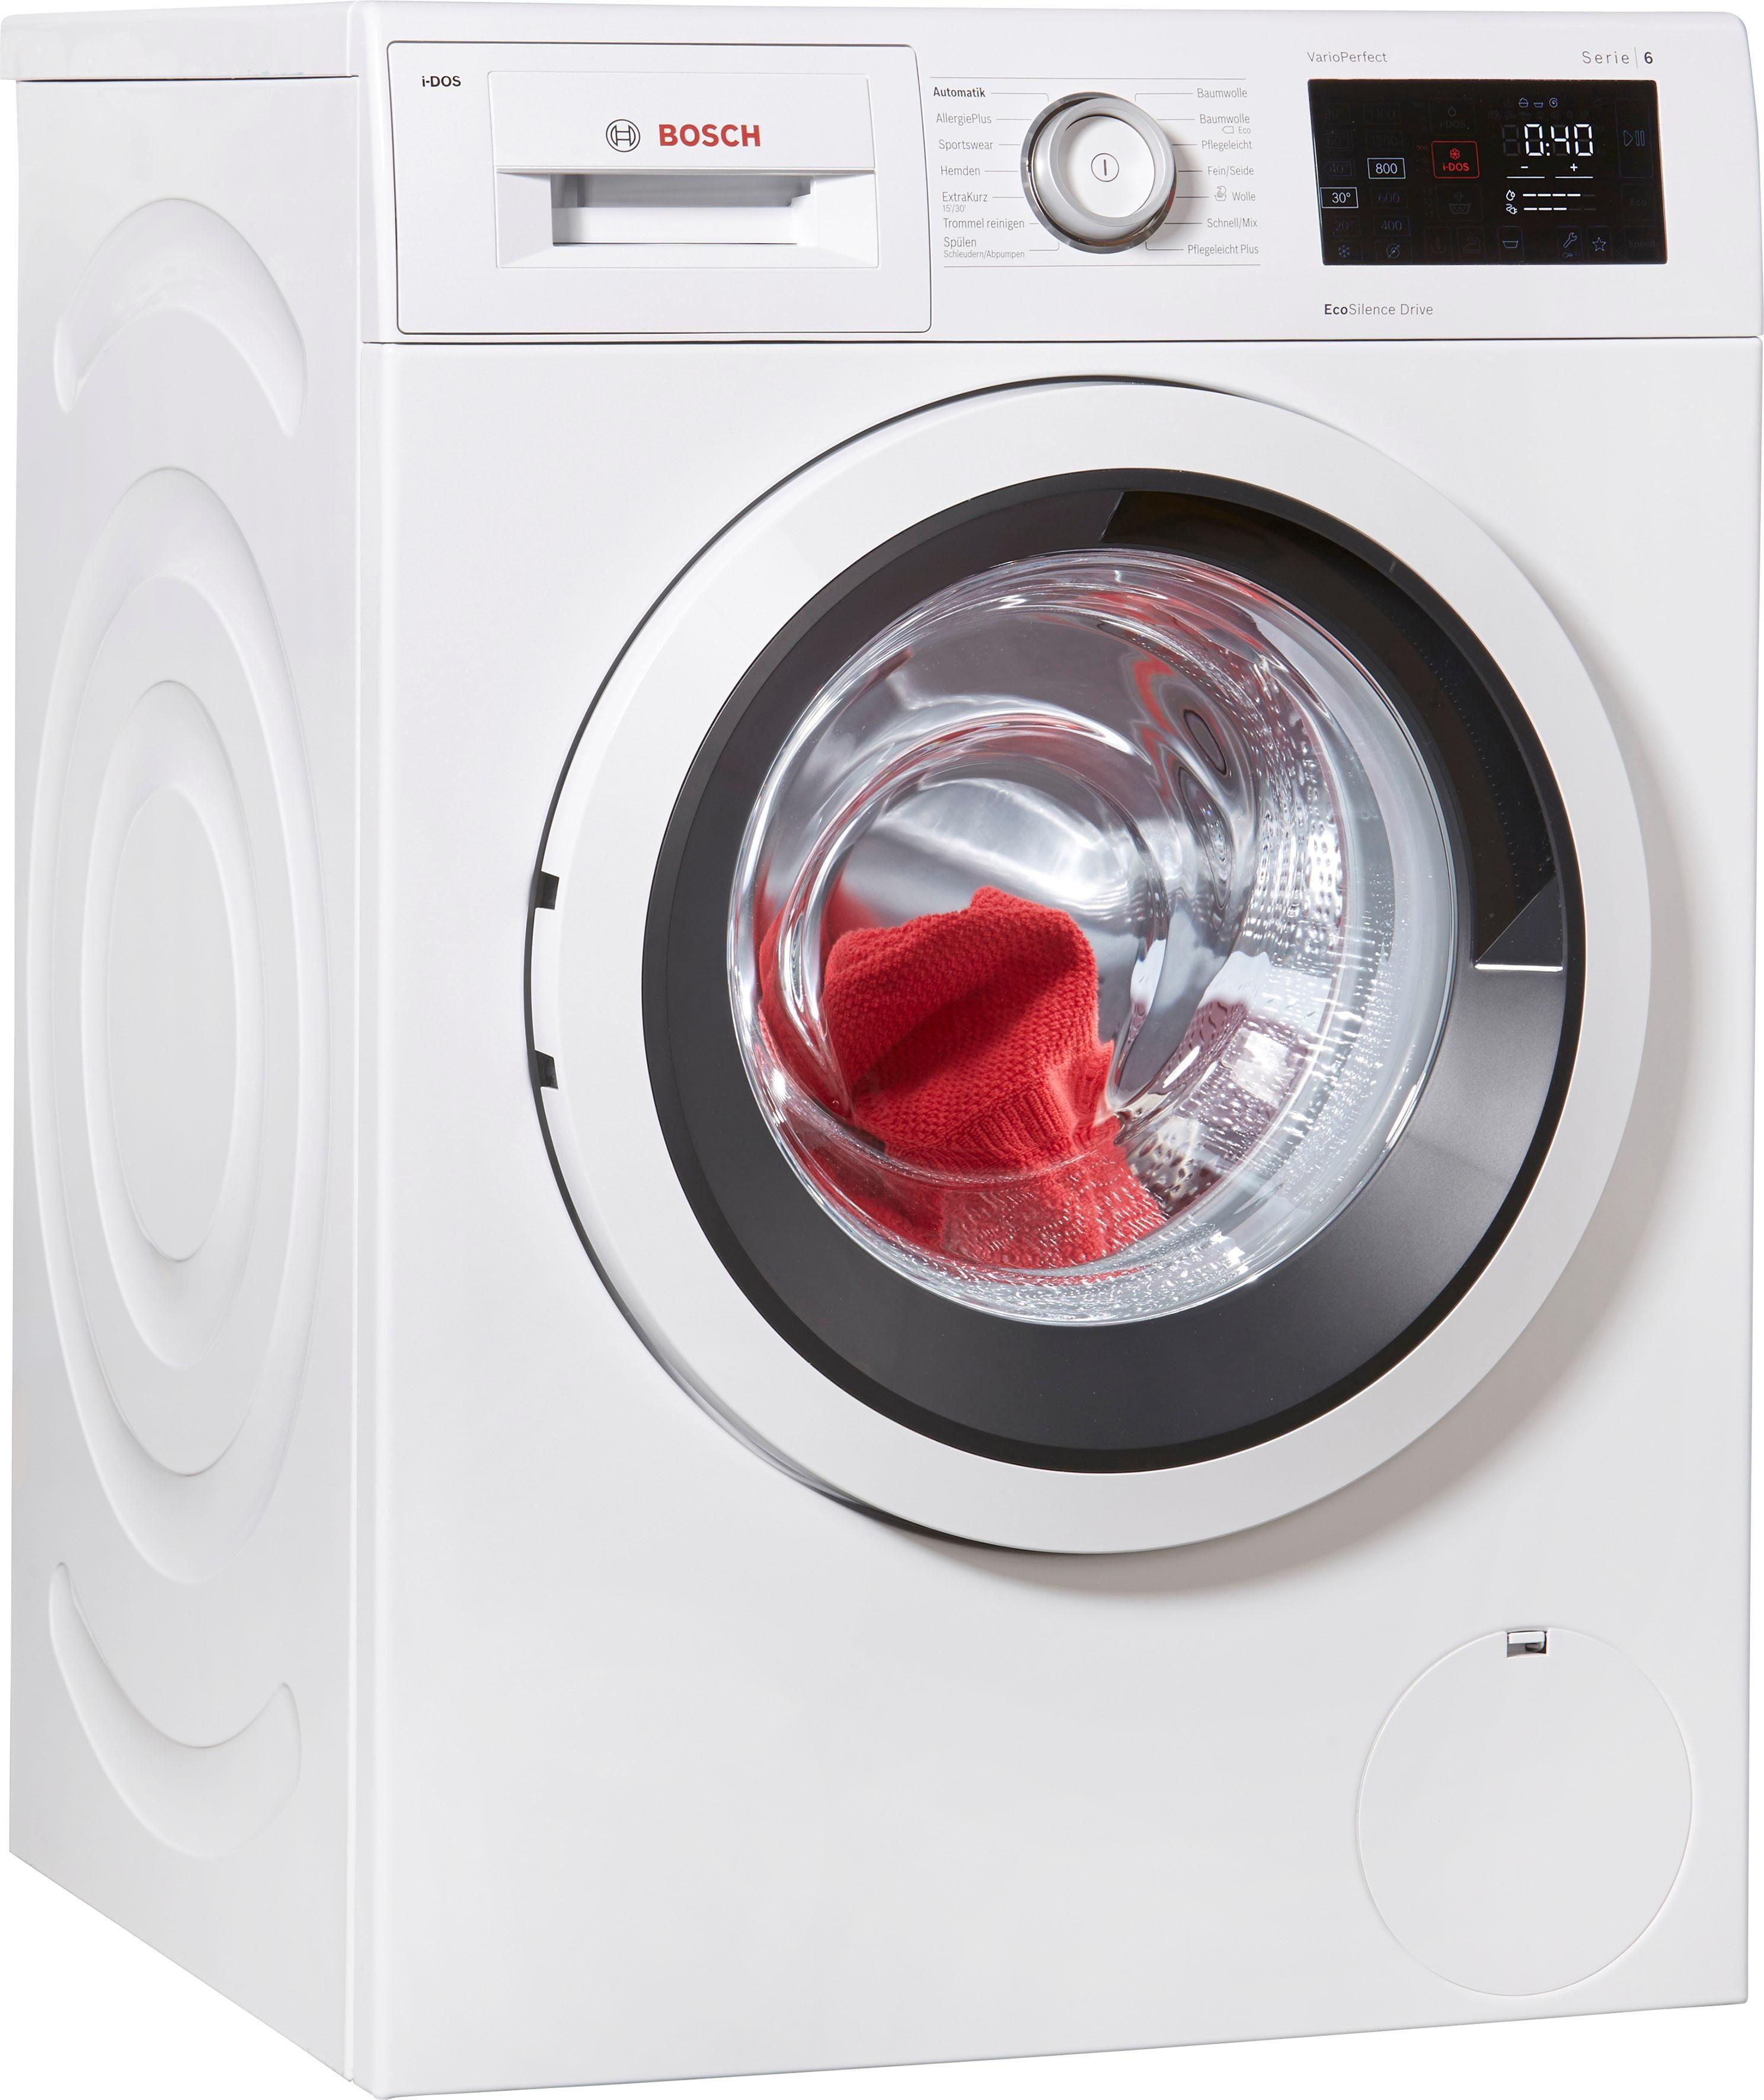 Bosch Waschmaschine Serie 6 Wat286v0 8 Kg 1400 U Min I Dos